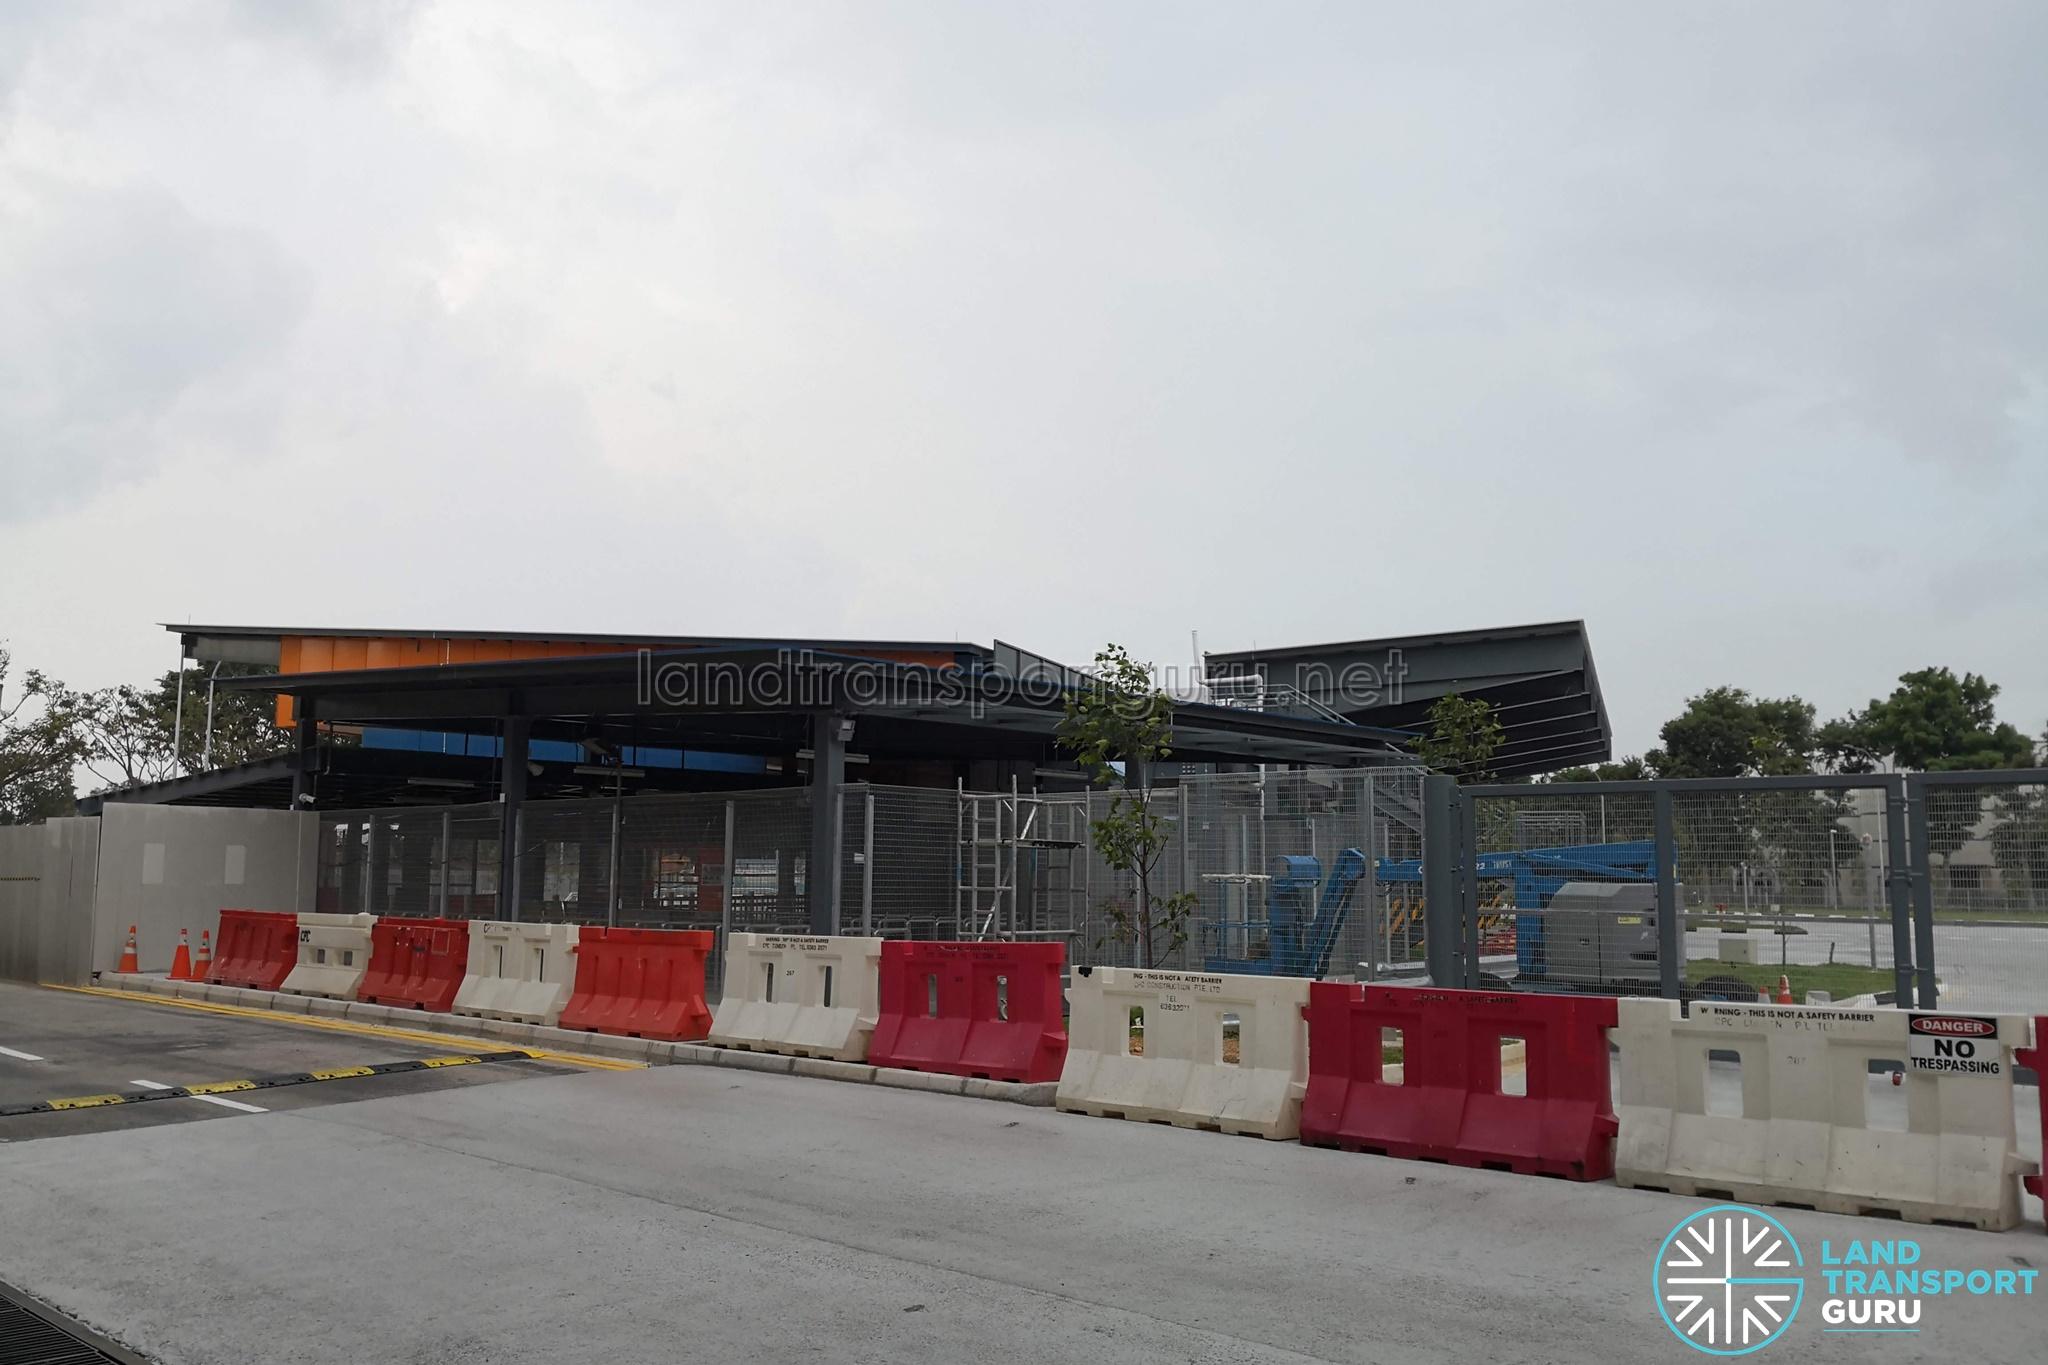 Yio Chu Kang Bus Interchange expanded concourse